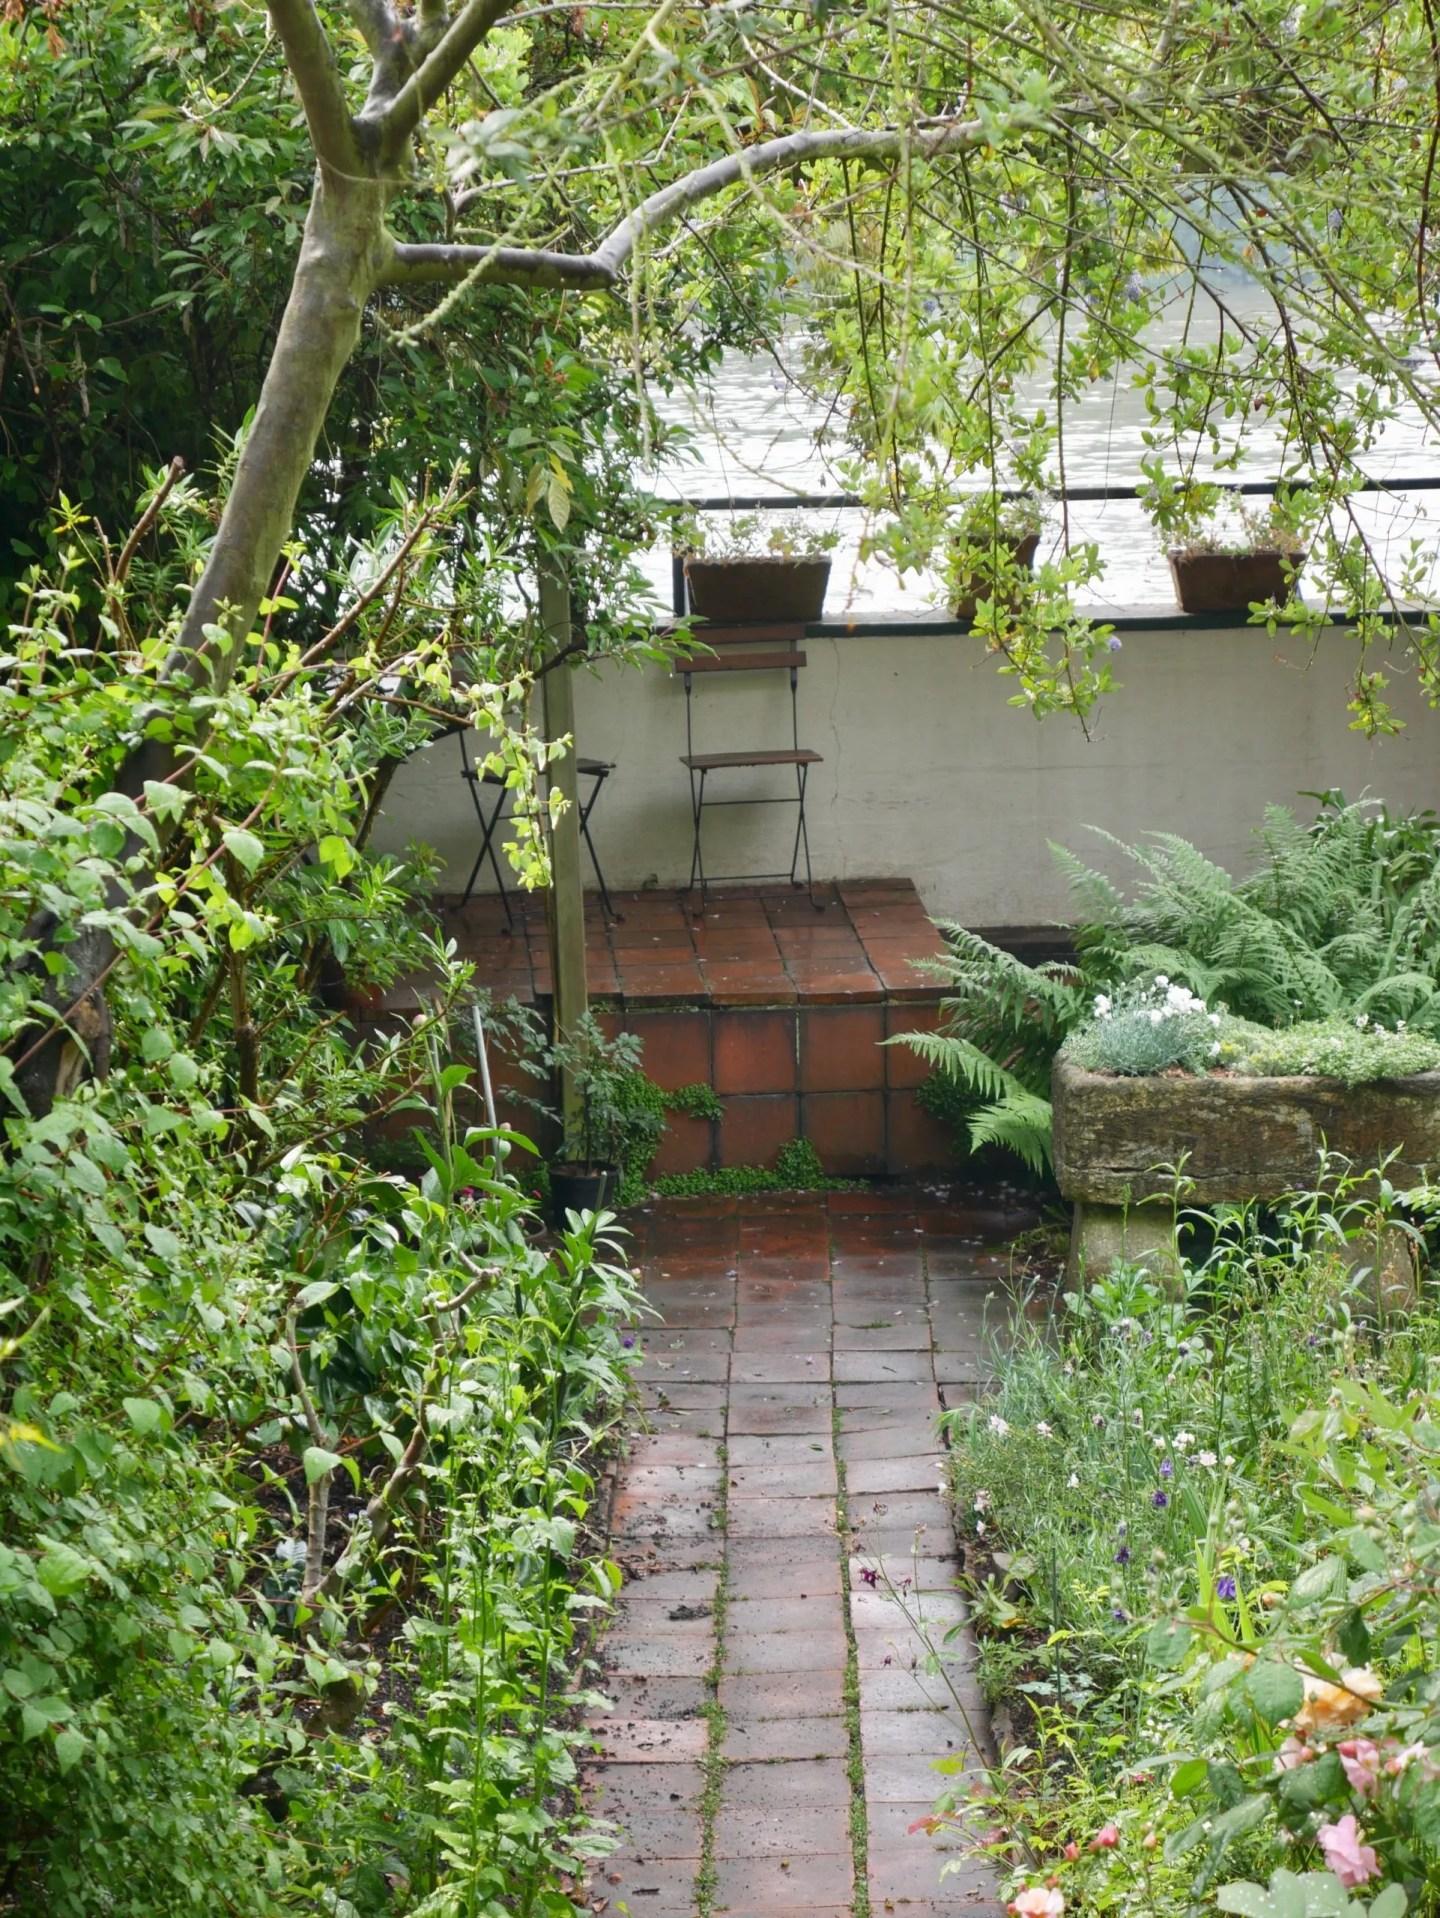 Emery Walker's house garden view